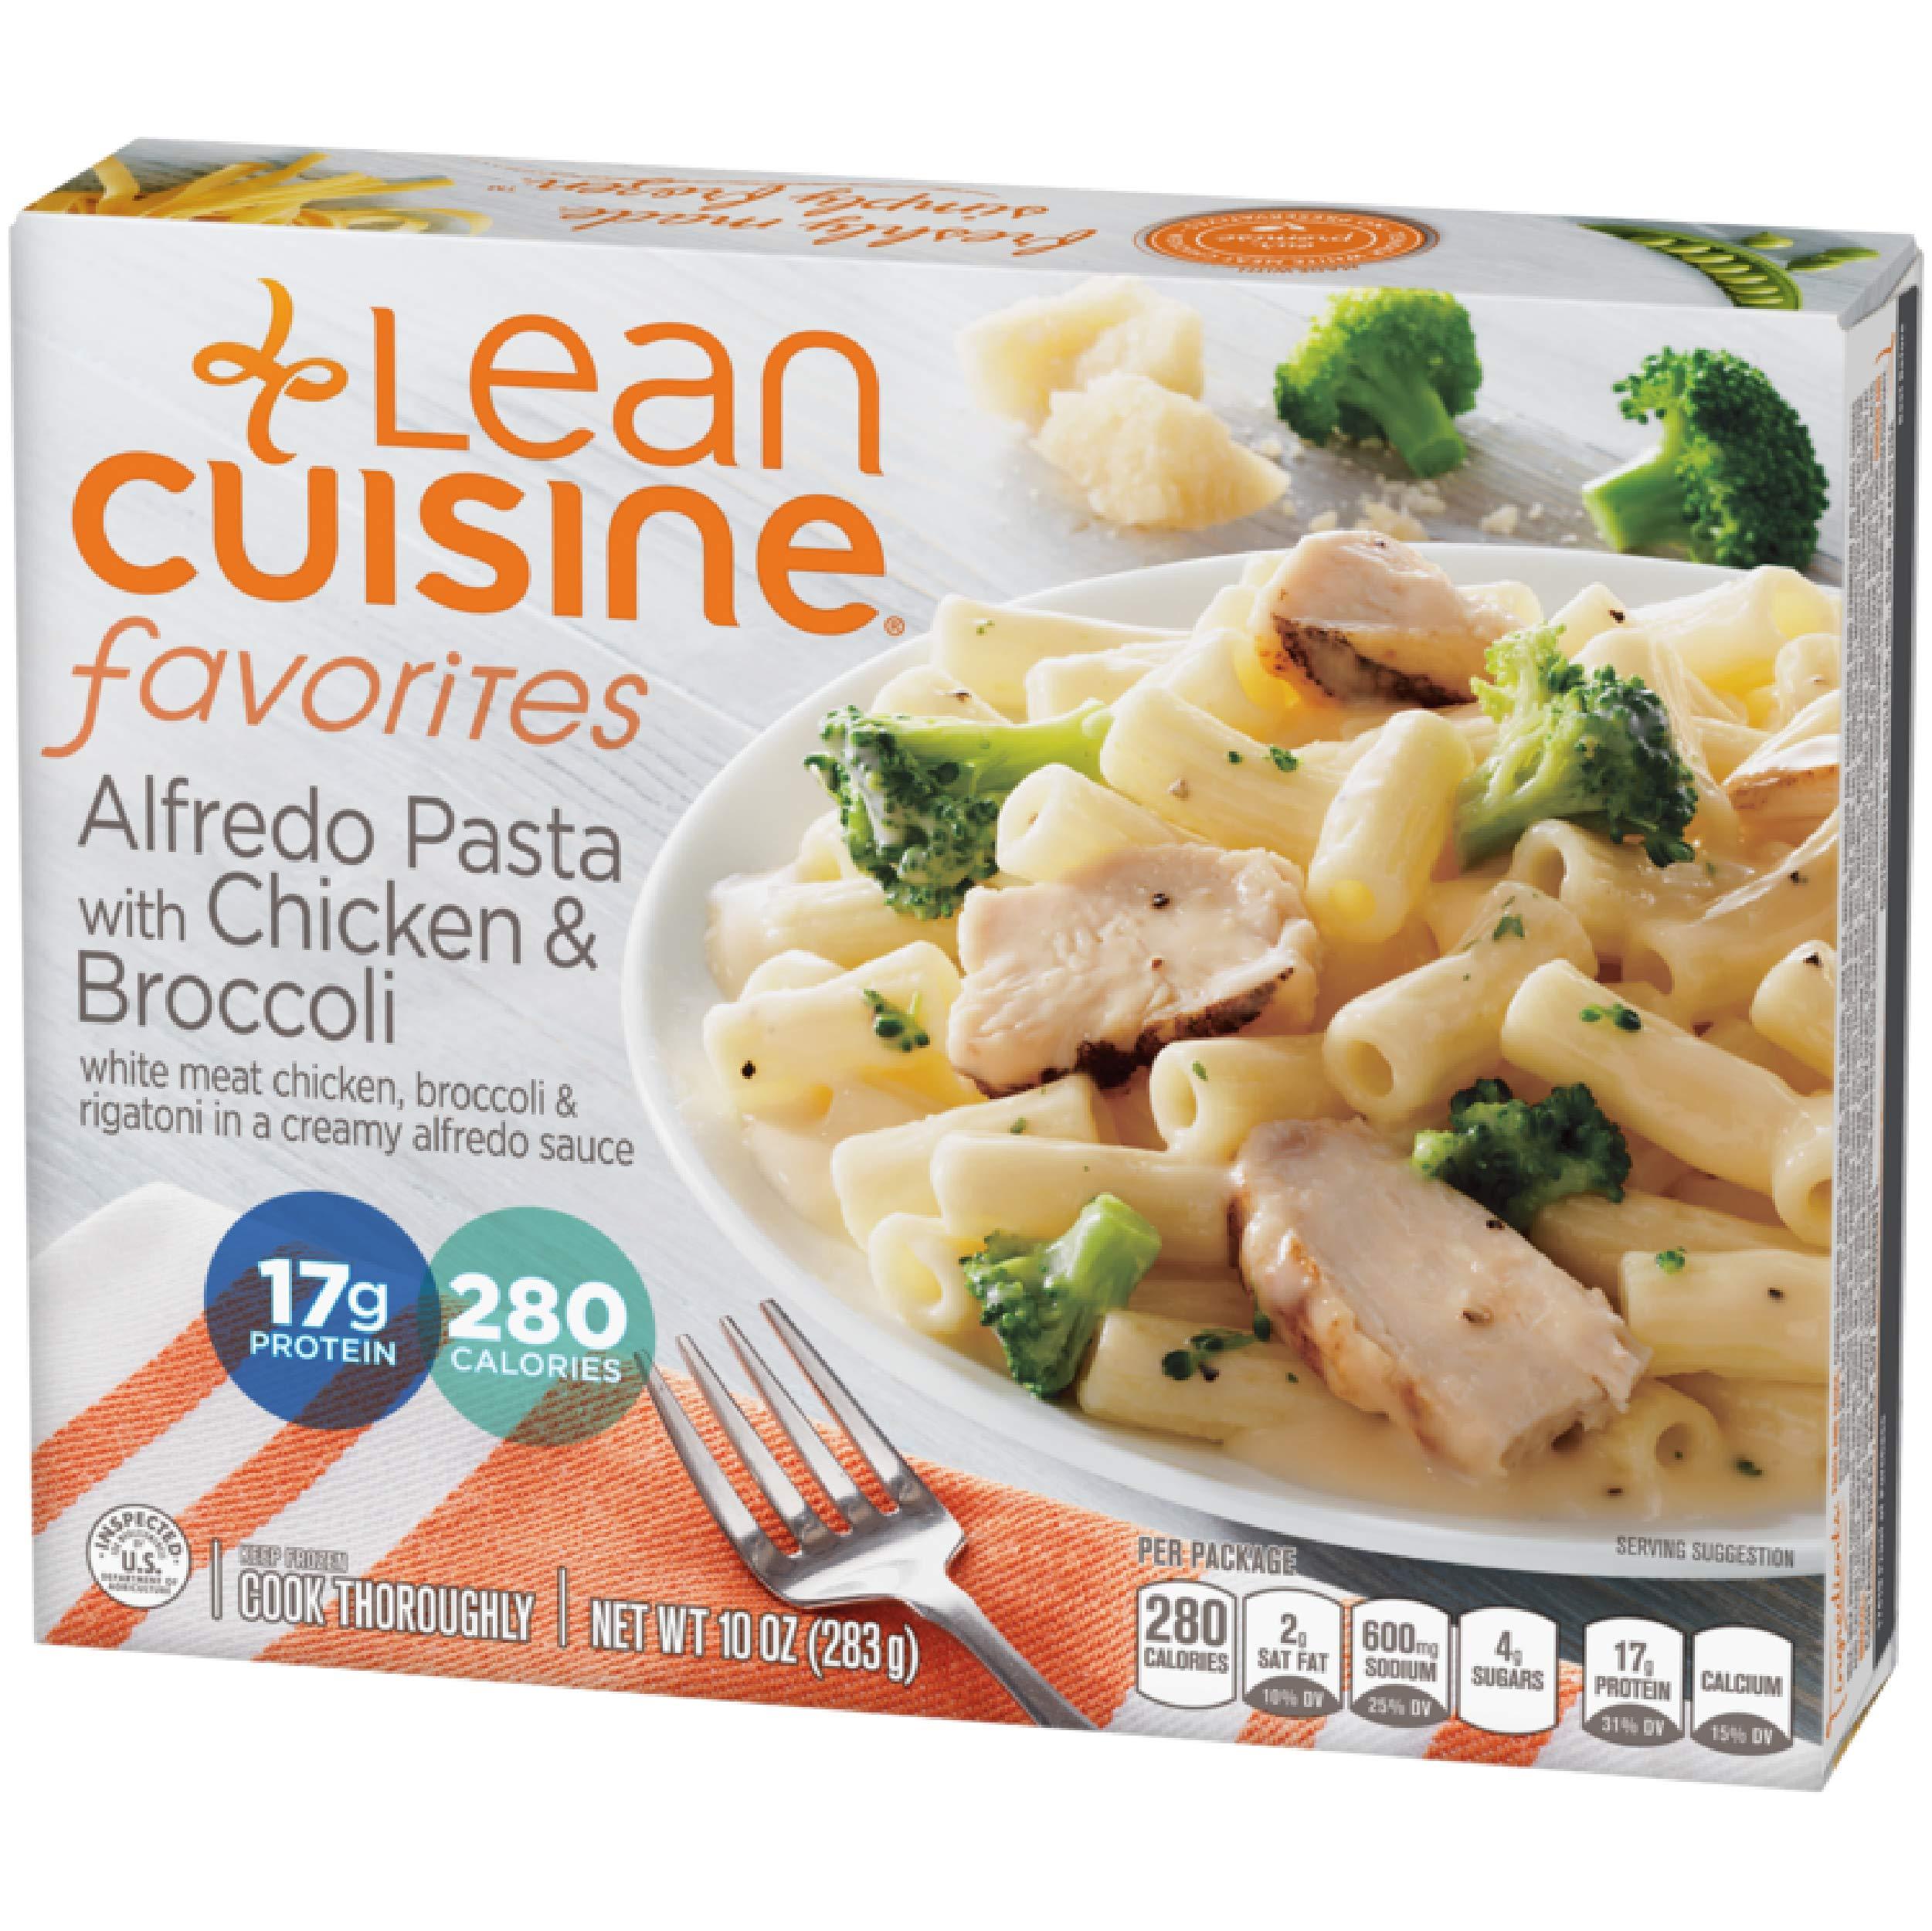 Lean Cuisine Favorites Alfredo Pasta with Chicken